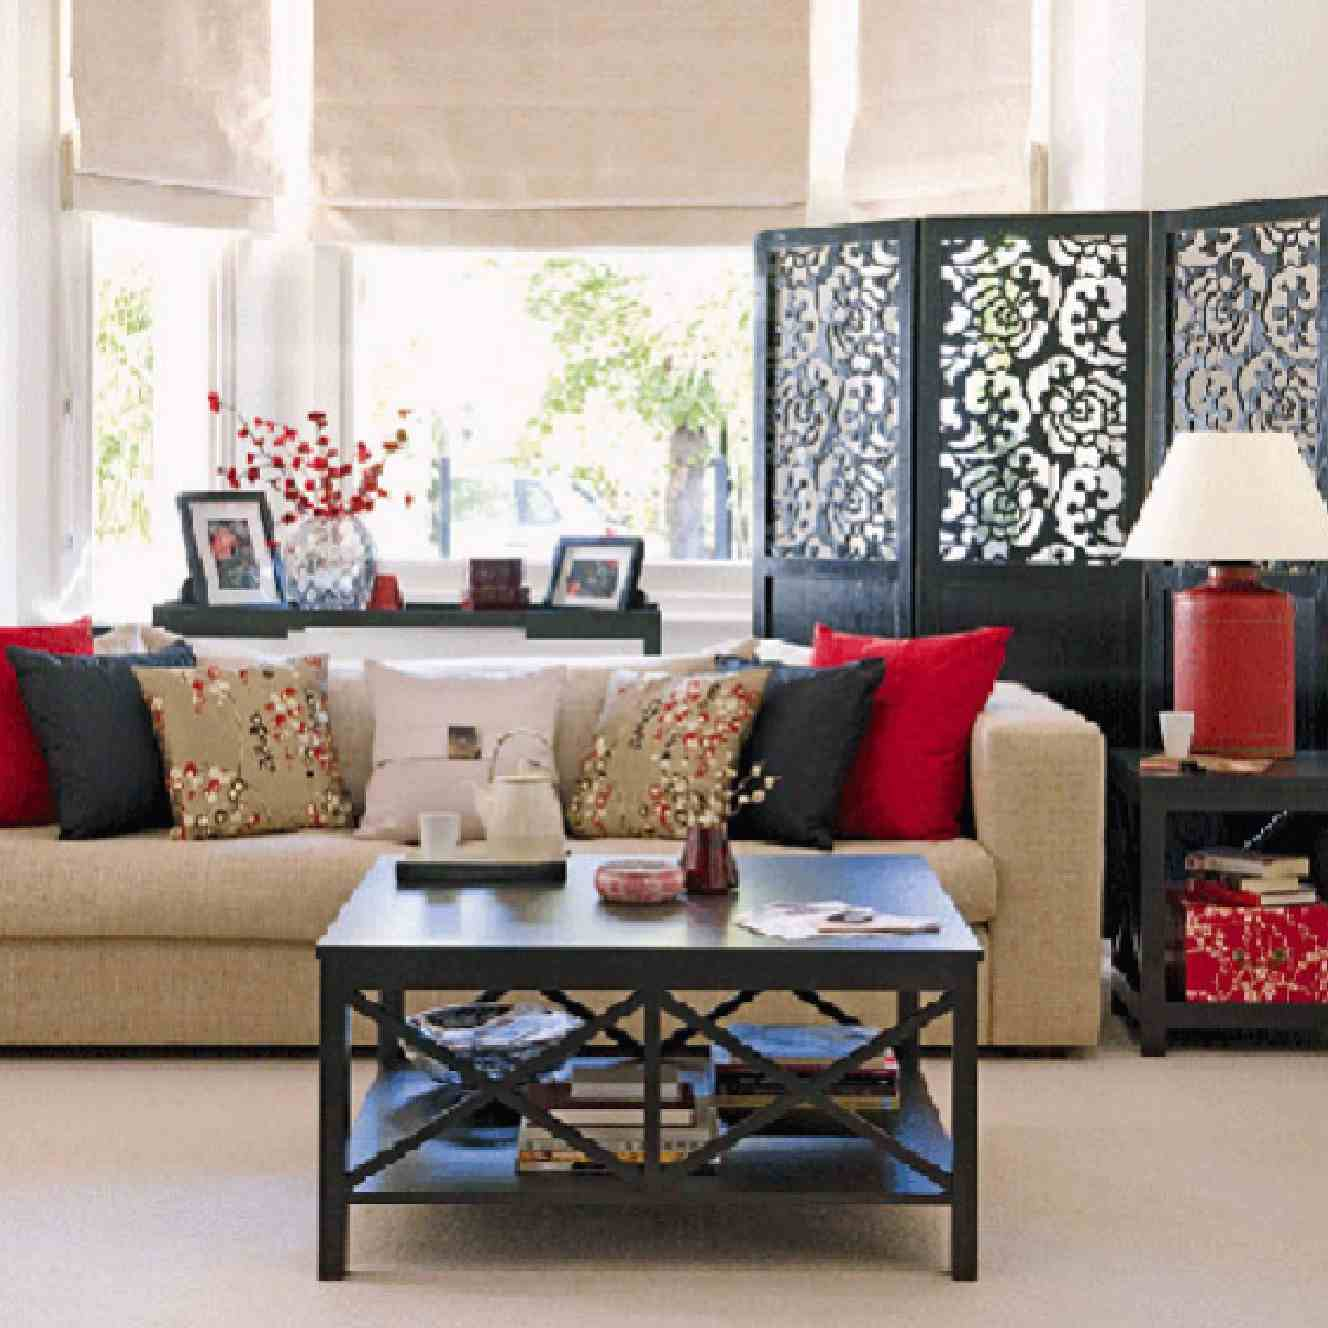 Not for boring decoraci n de estilo asi tico for Tranquil living room ideas